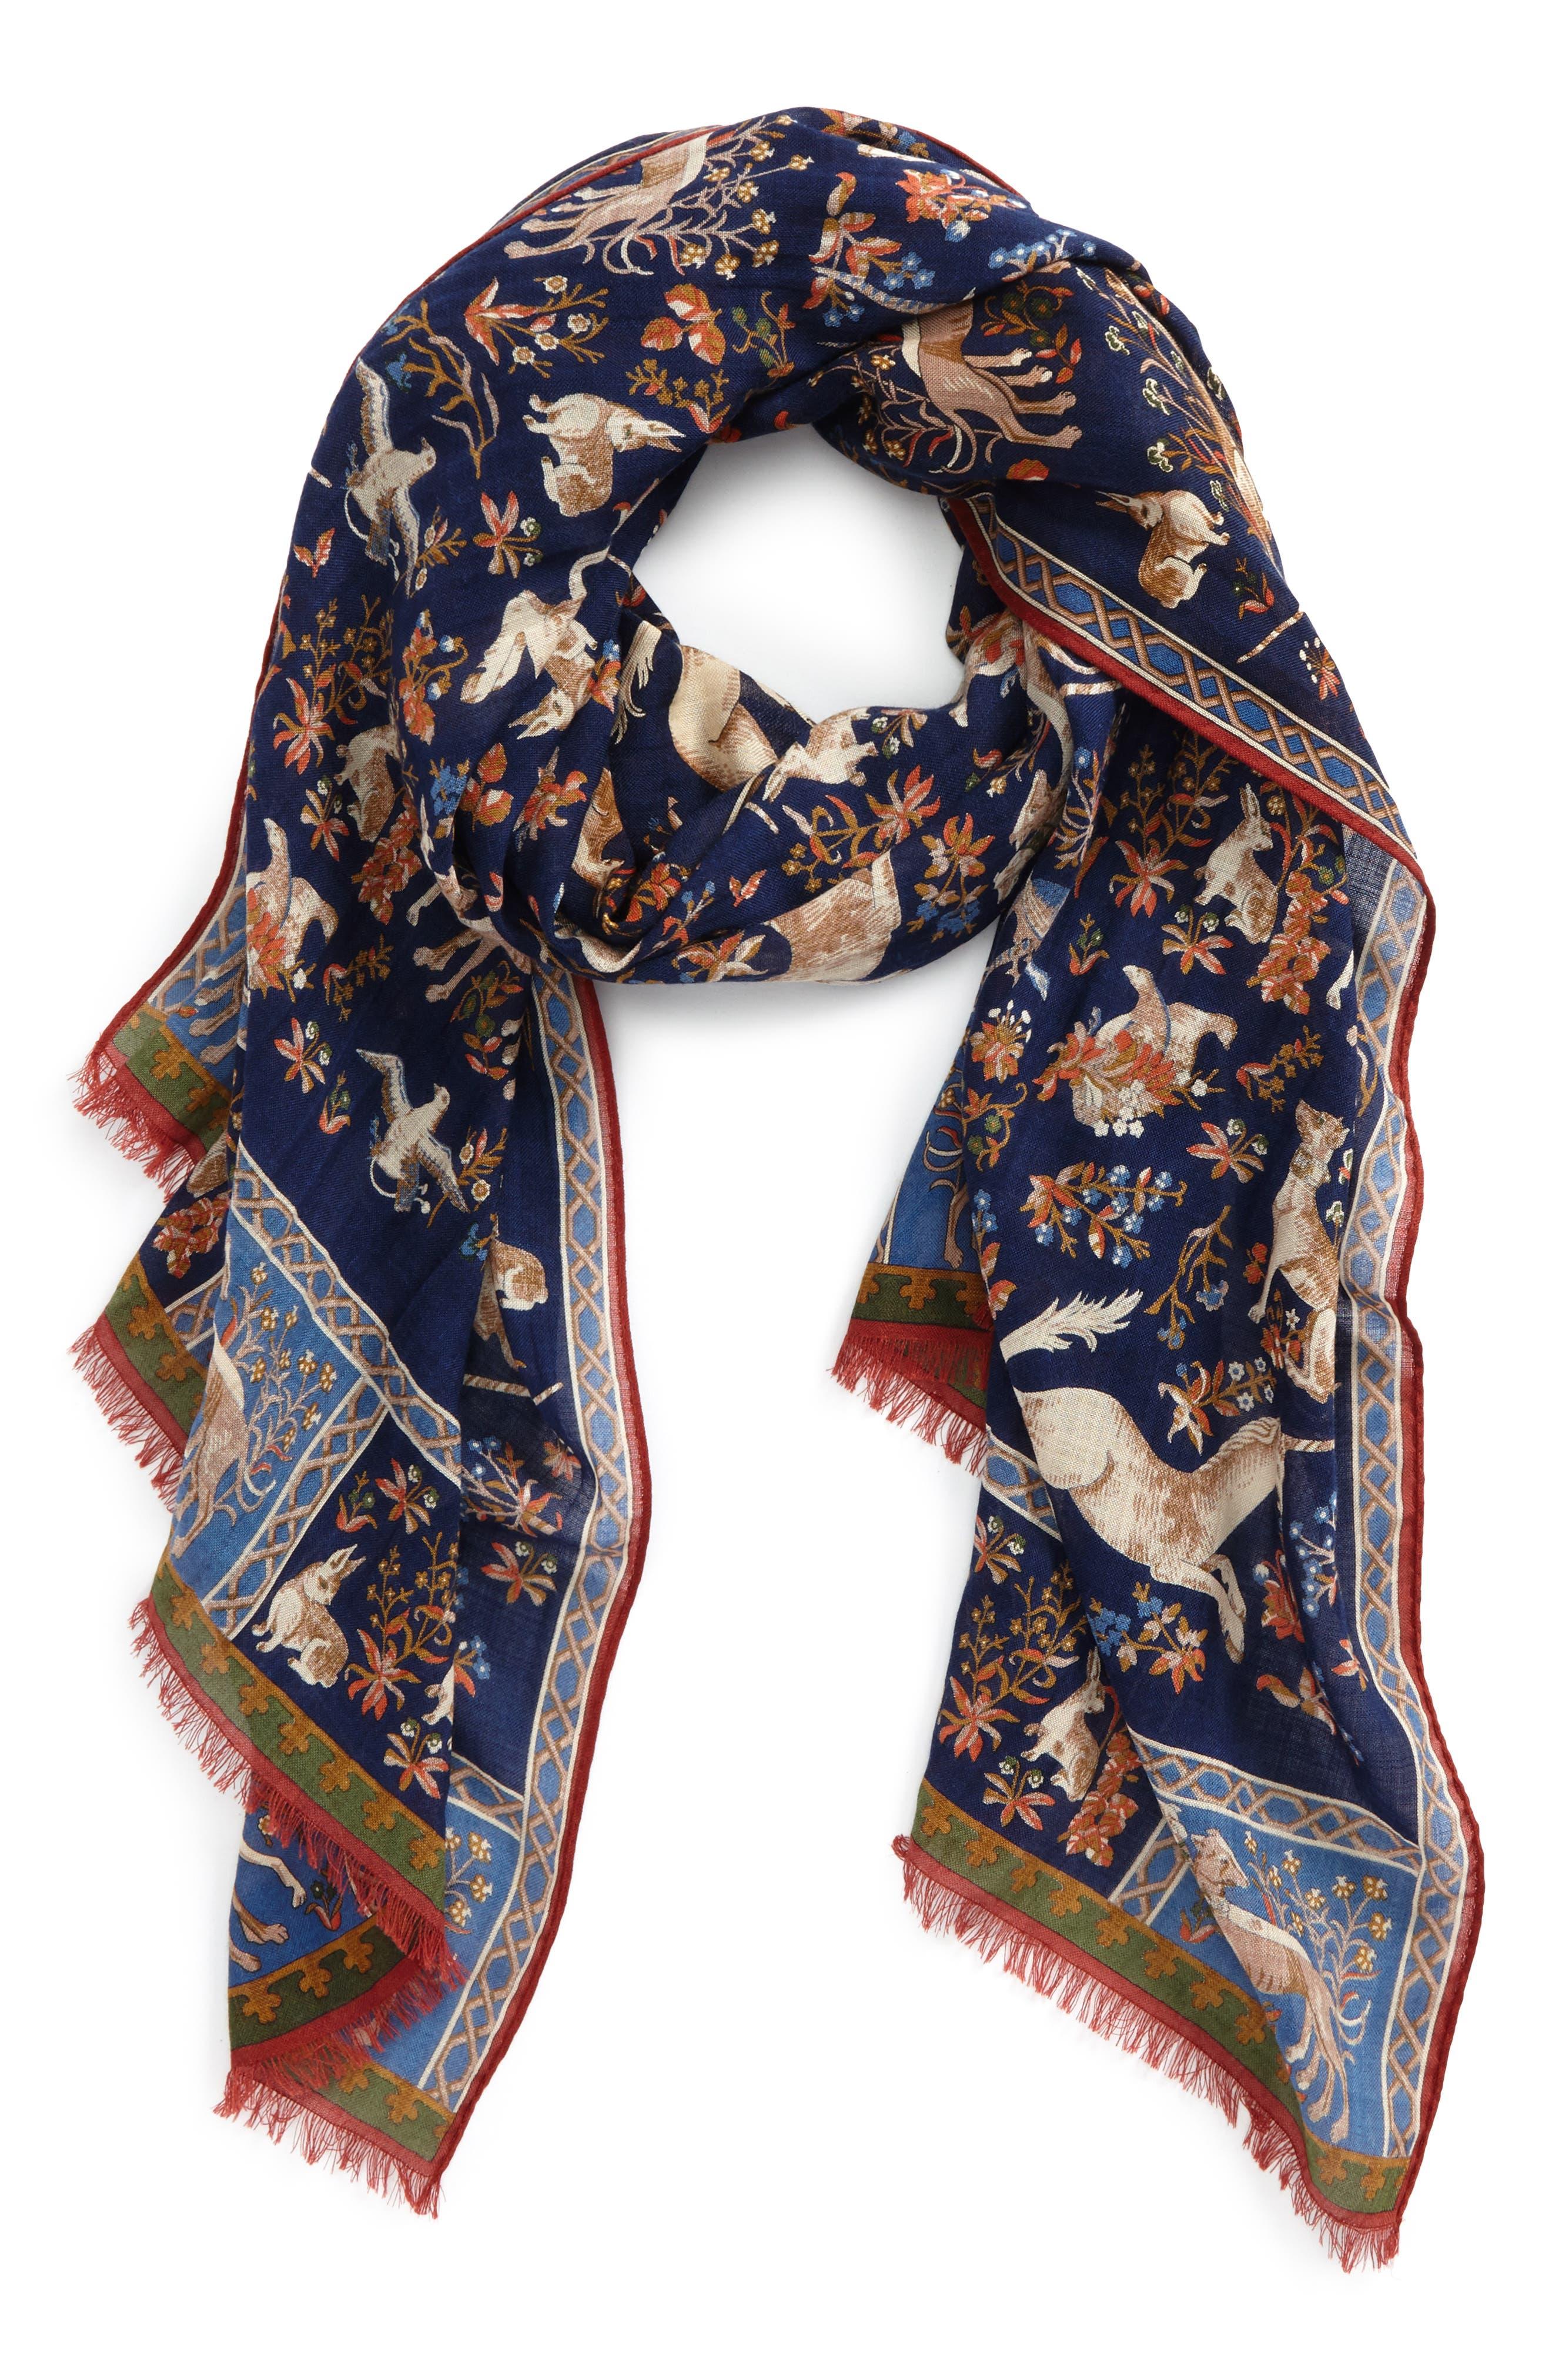 Drakes Unicorn Print Wool & Silk Scarf